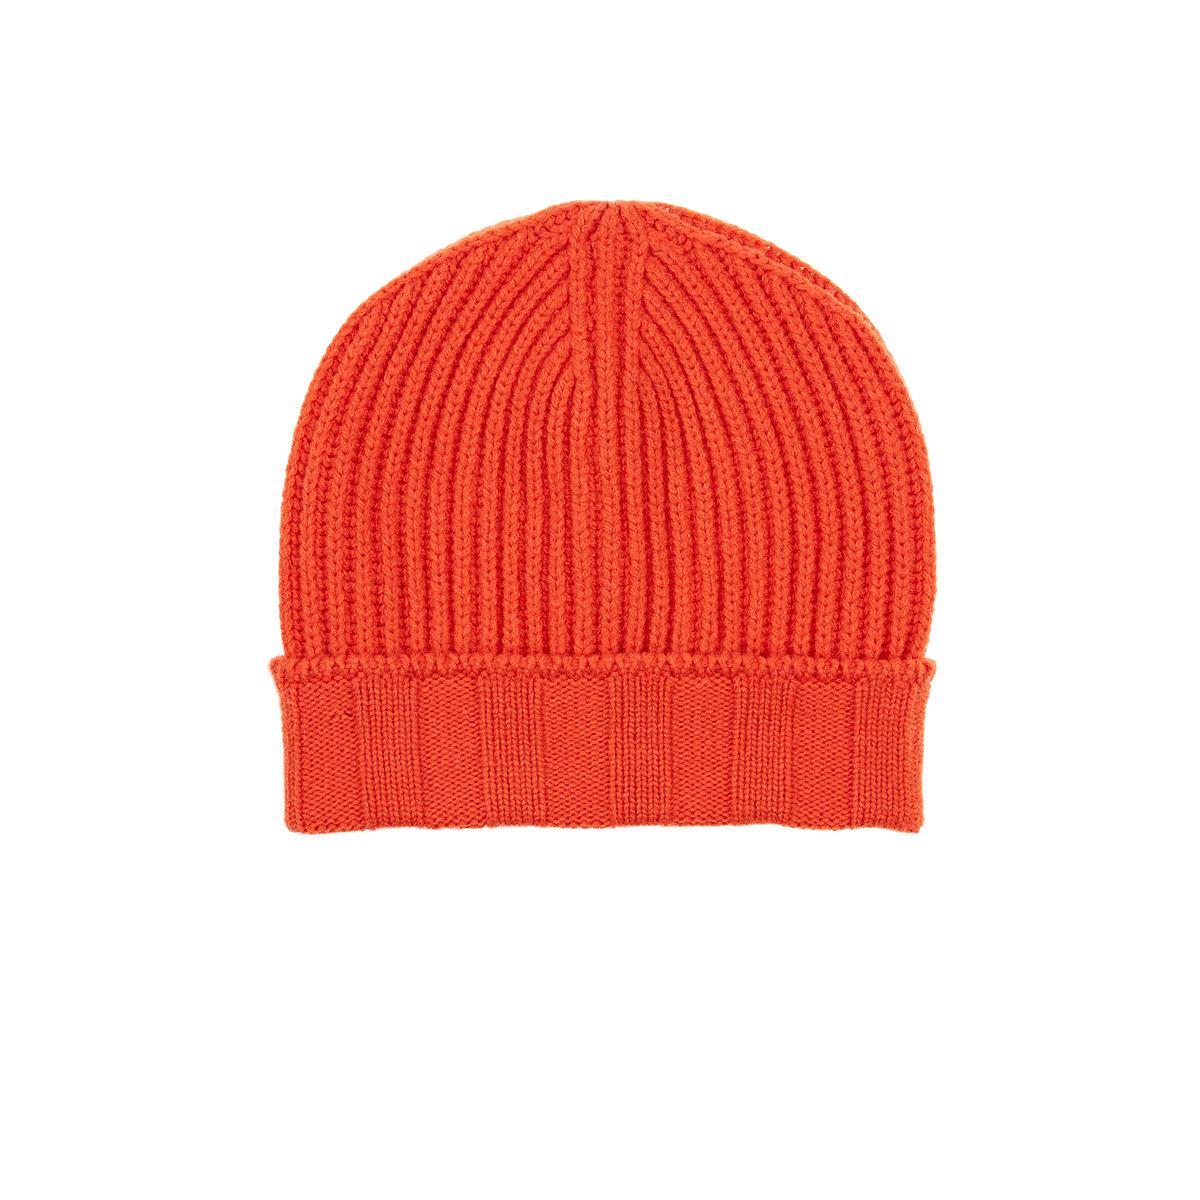 7d96436cd76 Barneys New York Rib-knit Wool in Orange for Men - Lyst